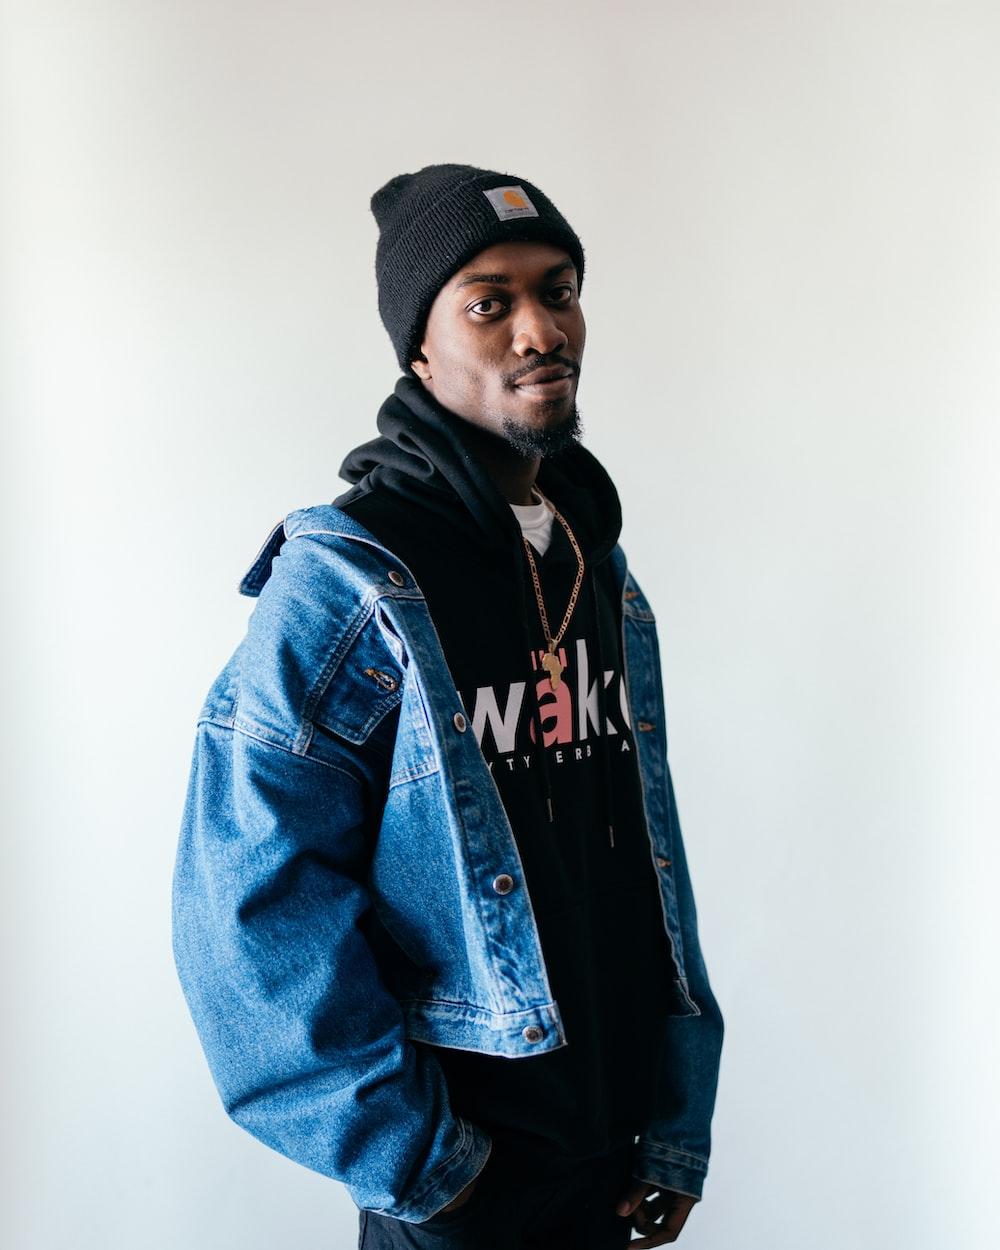 man in blue denim jacket and black knit cap